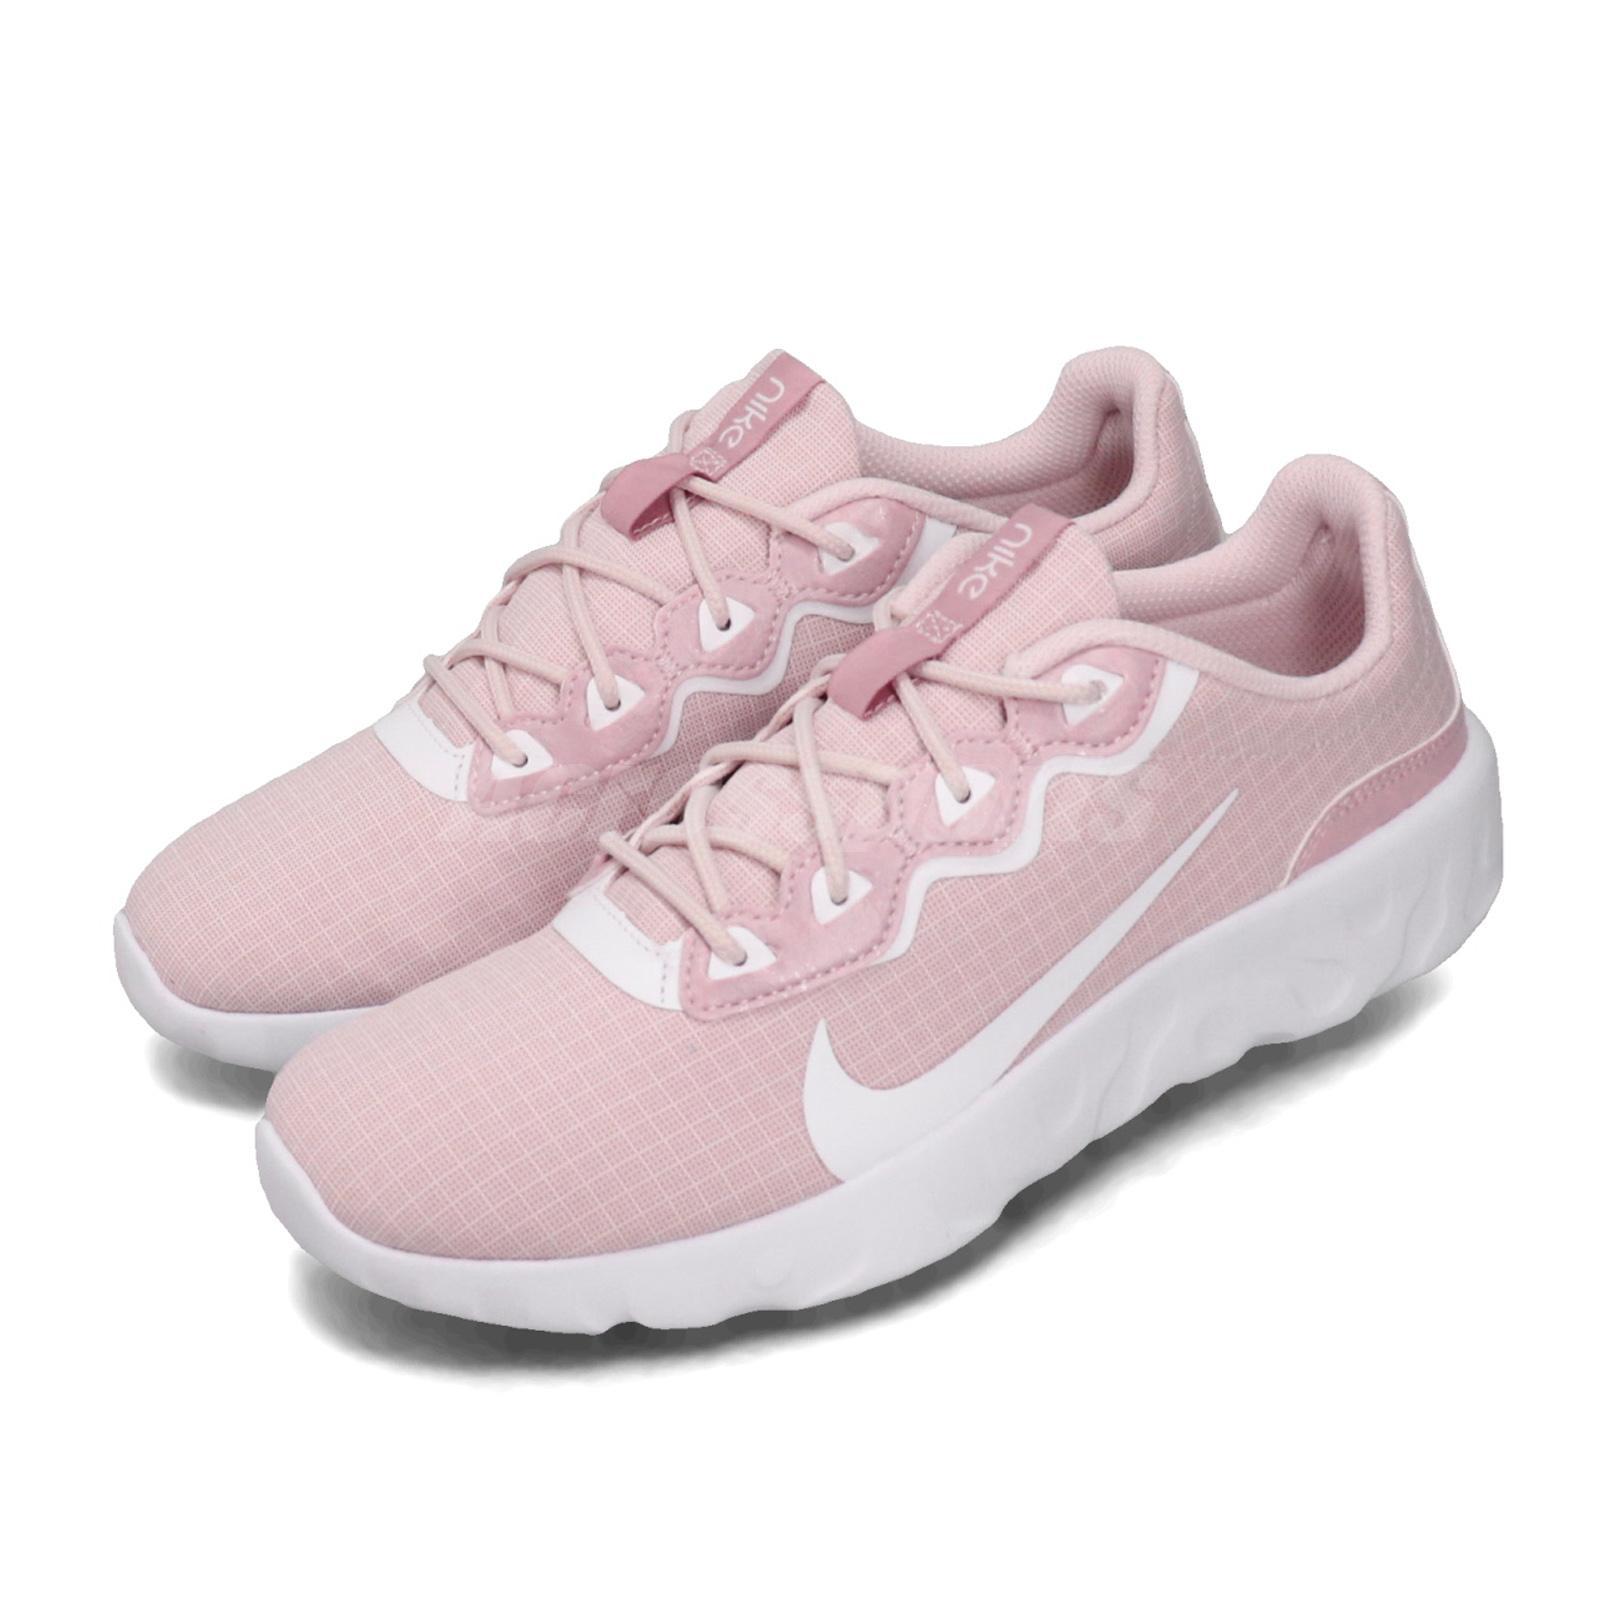 Nike Wmns Explore Strada Barely Rose